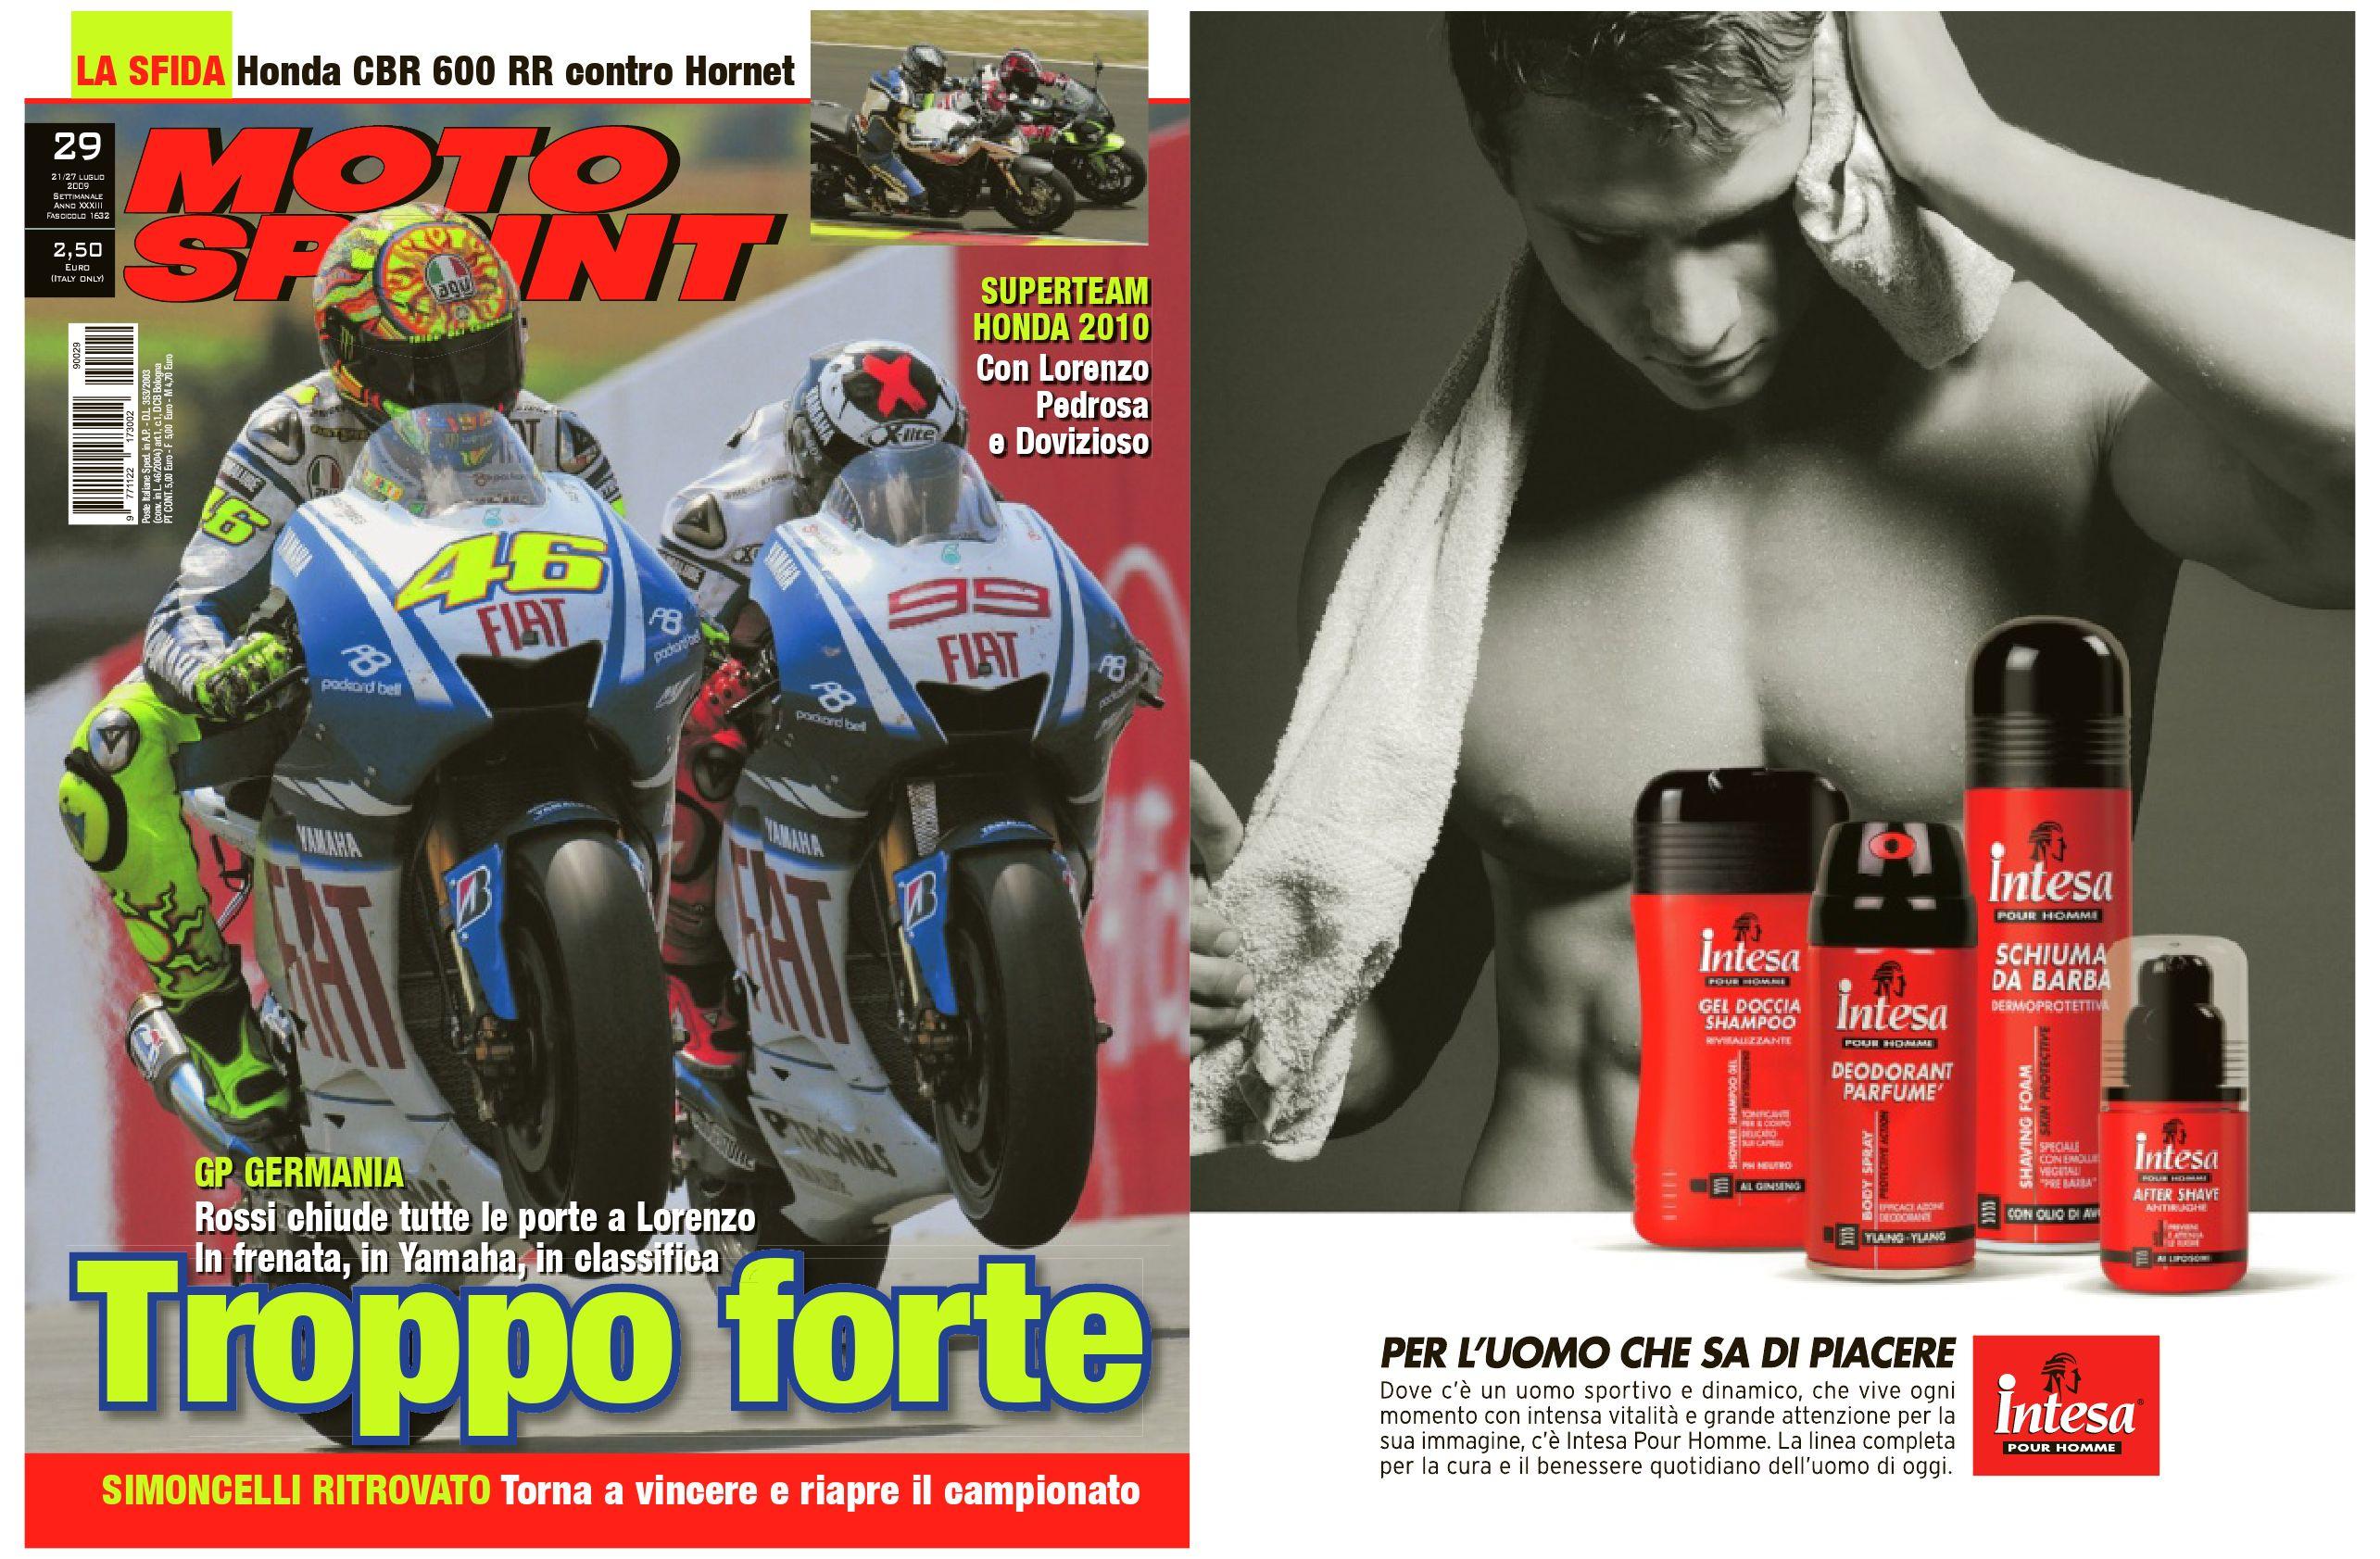 MotoSprint 29 by Divisione Multimedia Sport Network SRL - issuu ab158b594bb1